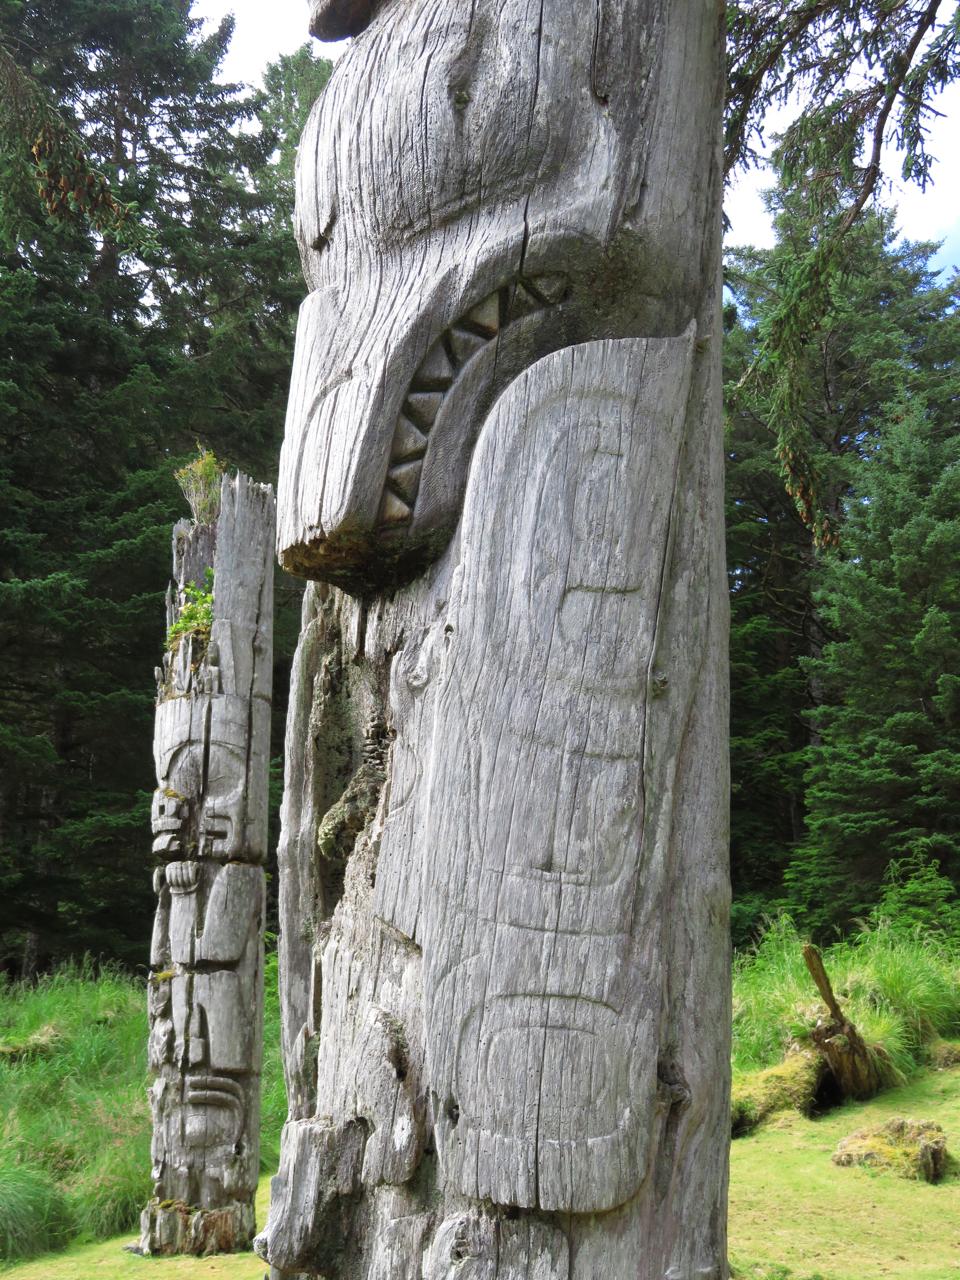 Beaver totem beaver depicted in haida carved totem haida gwaii